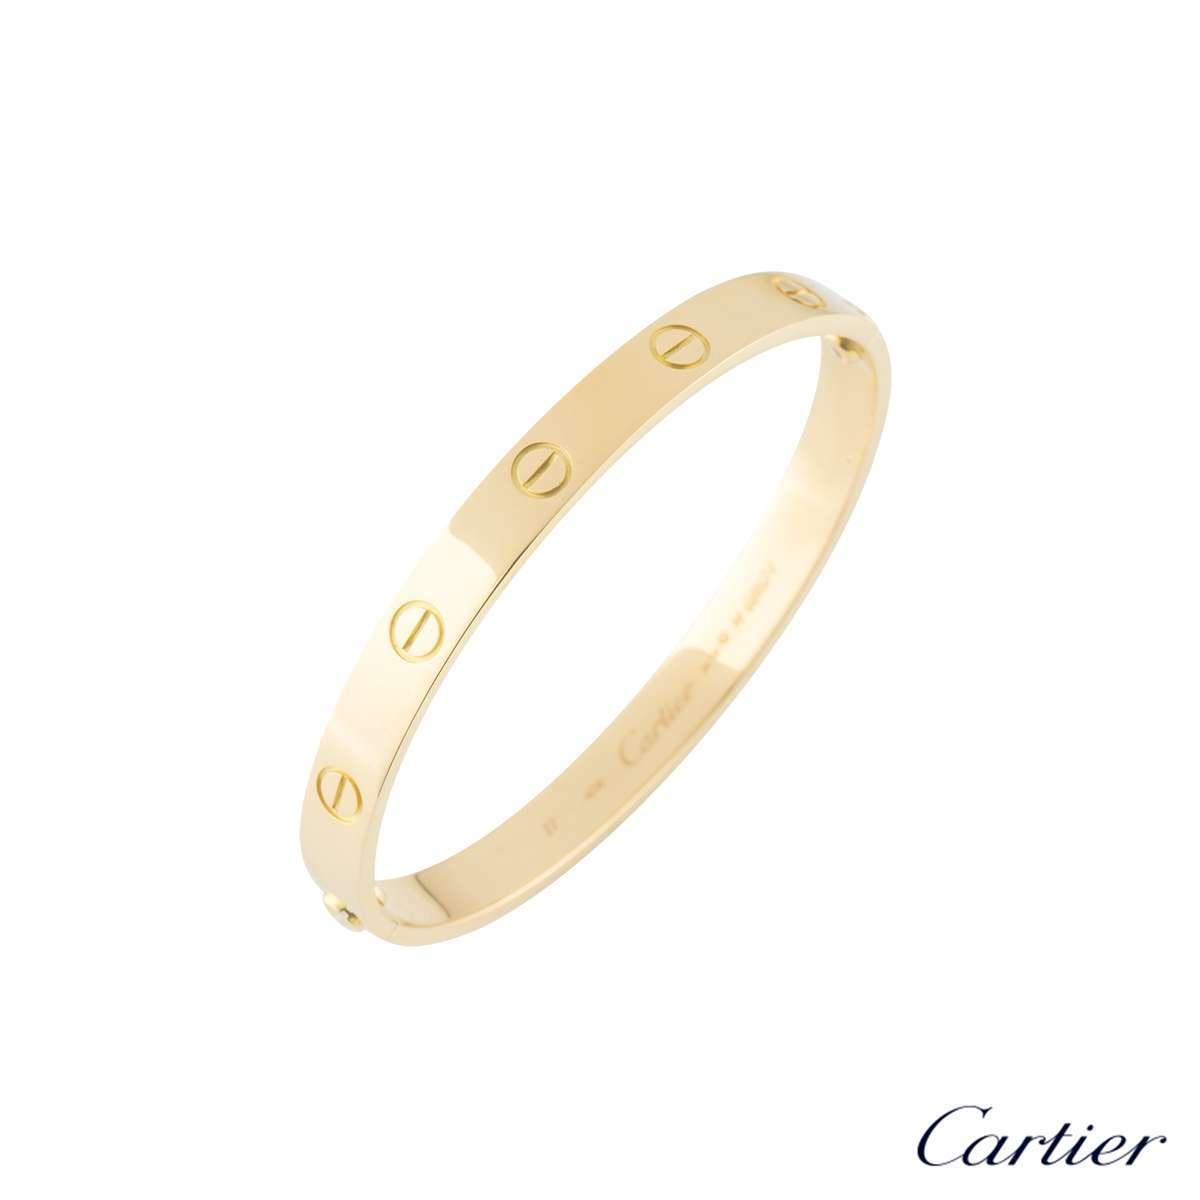 Cartier Yellow Gold Plain Love Bracelet Size 18B6035518